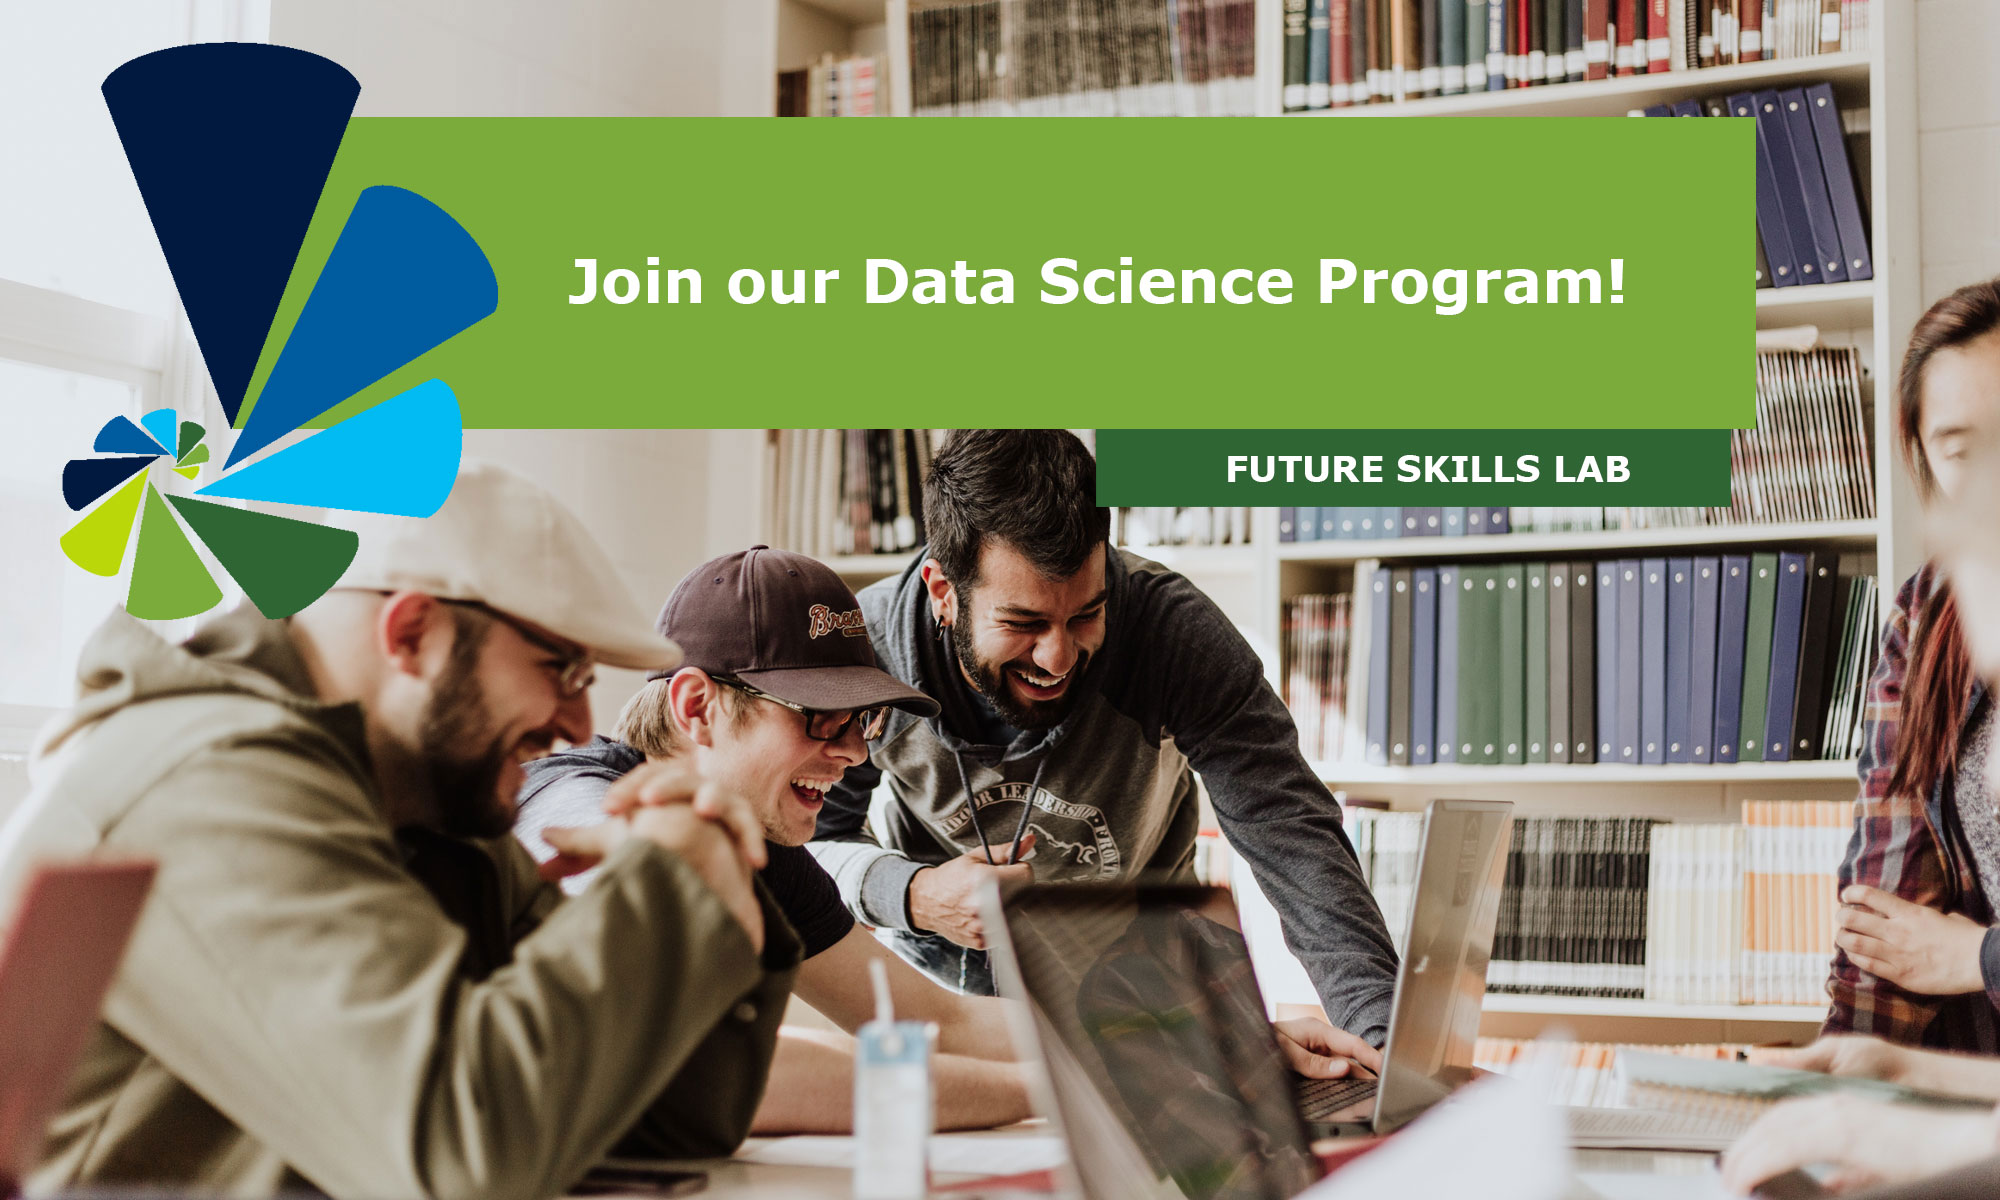 future skills lab meetup